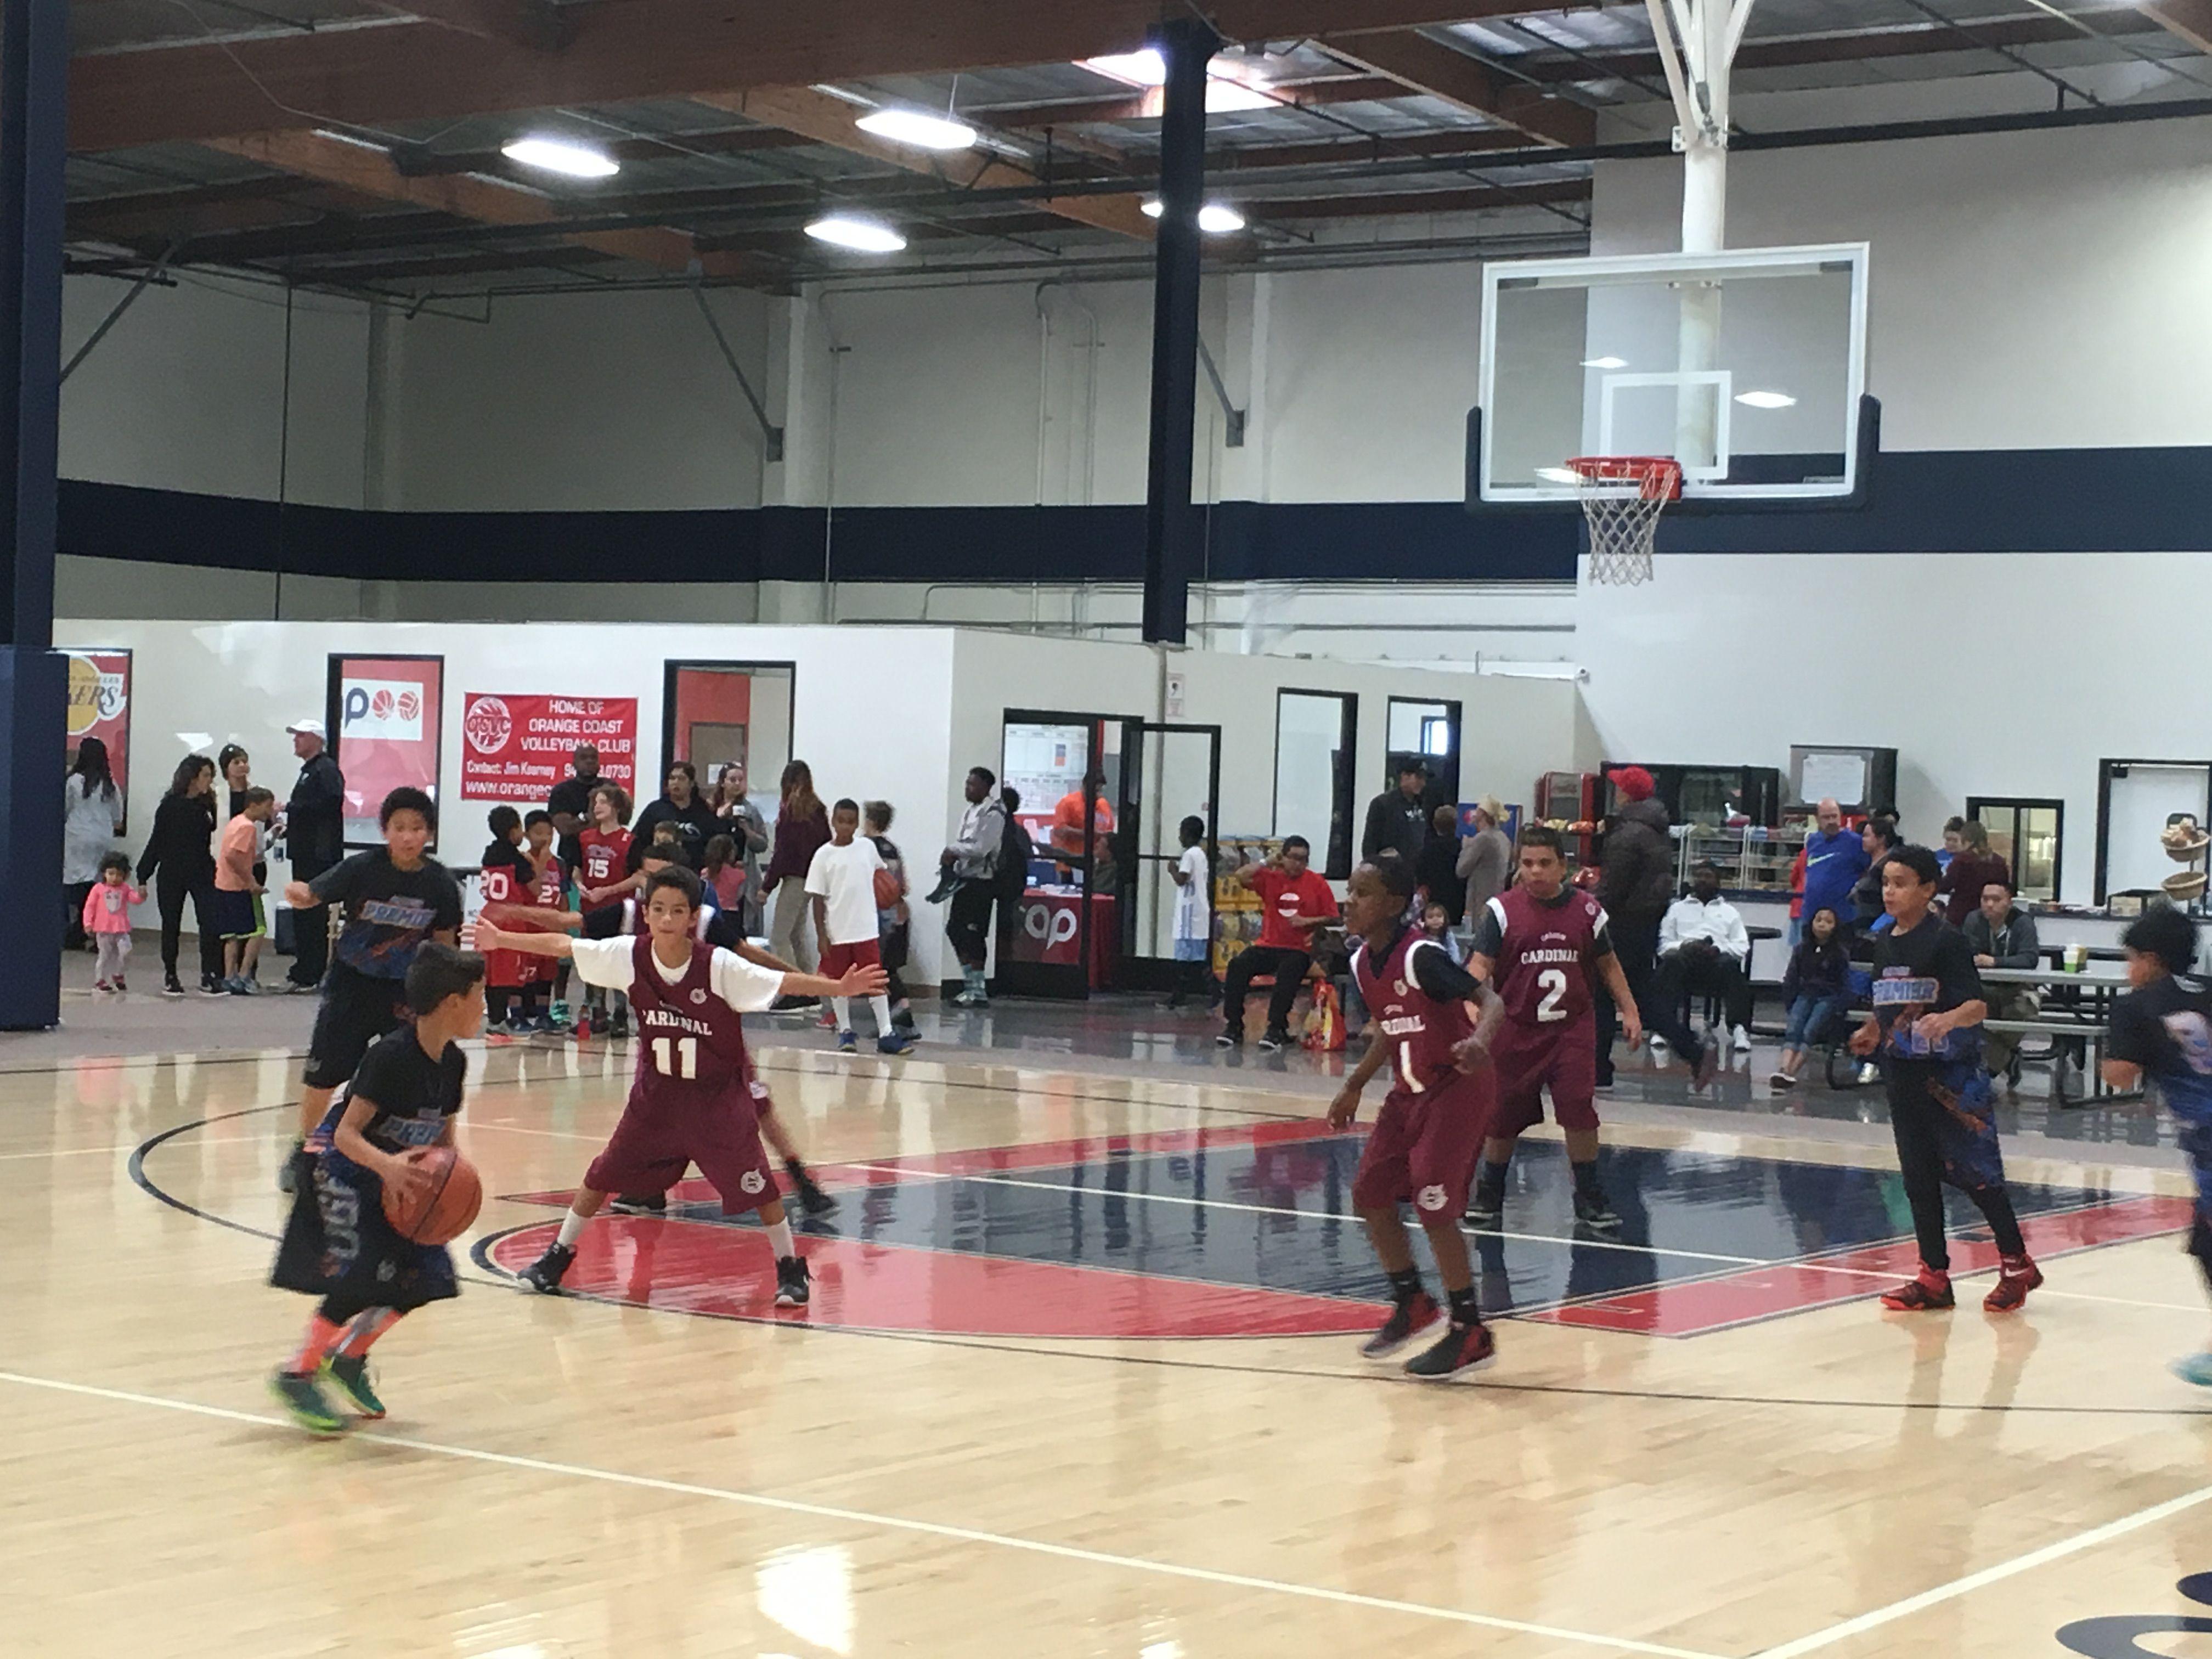 Everypost Aau Basketball Cardinals Basketball Open Gym